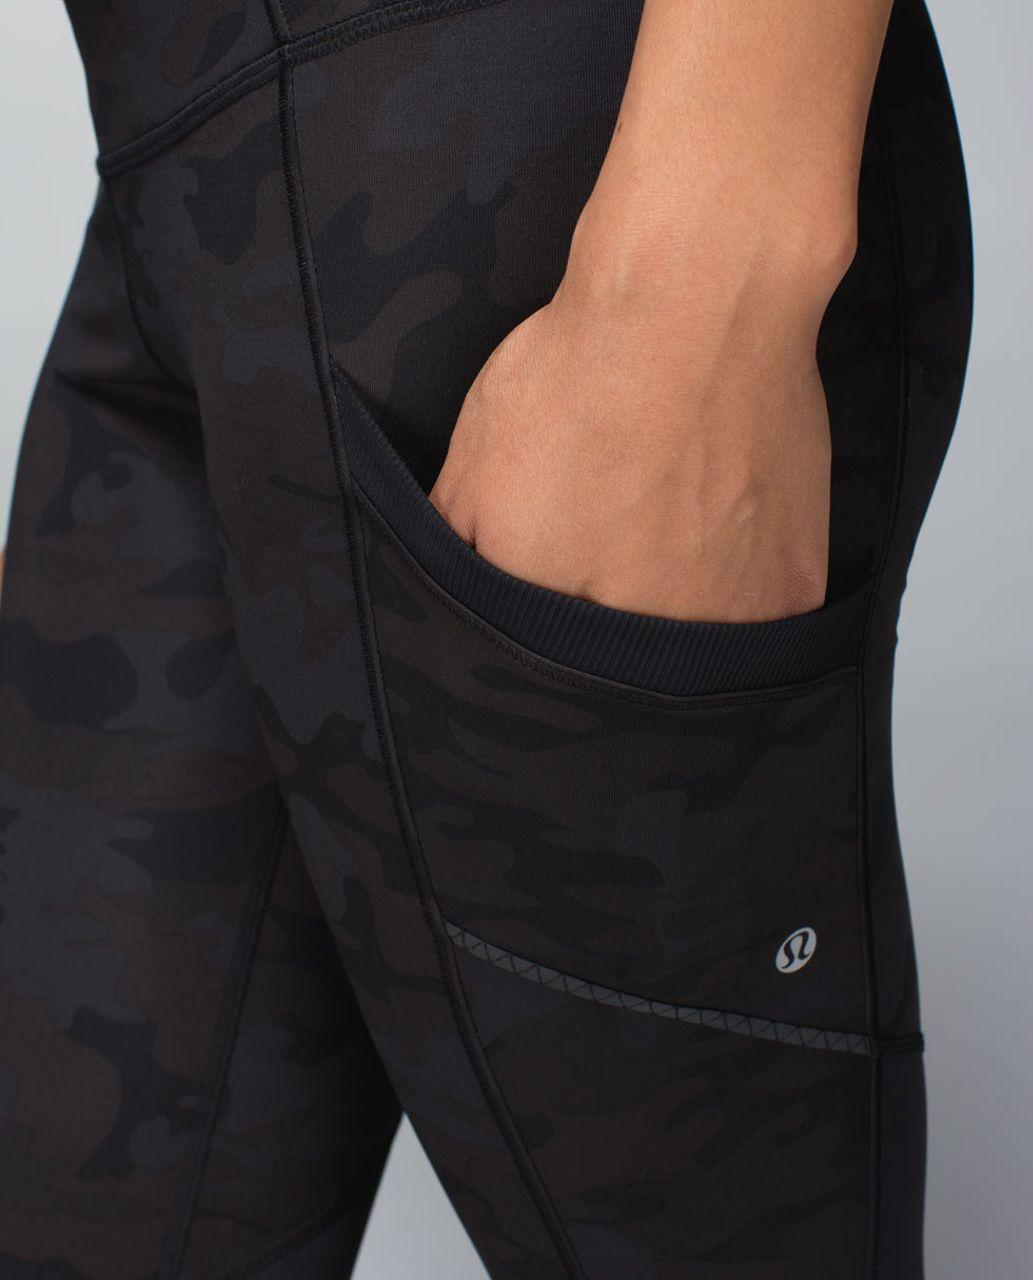 Lululemon Run For Fun Crop *Full-On Luxtreme - Savasana Camo 20cm New Black / Black